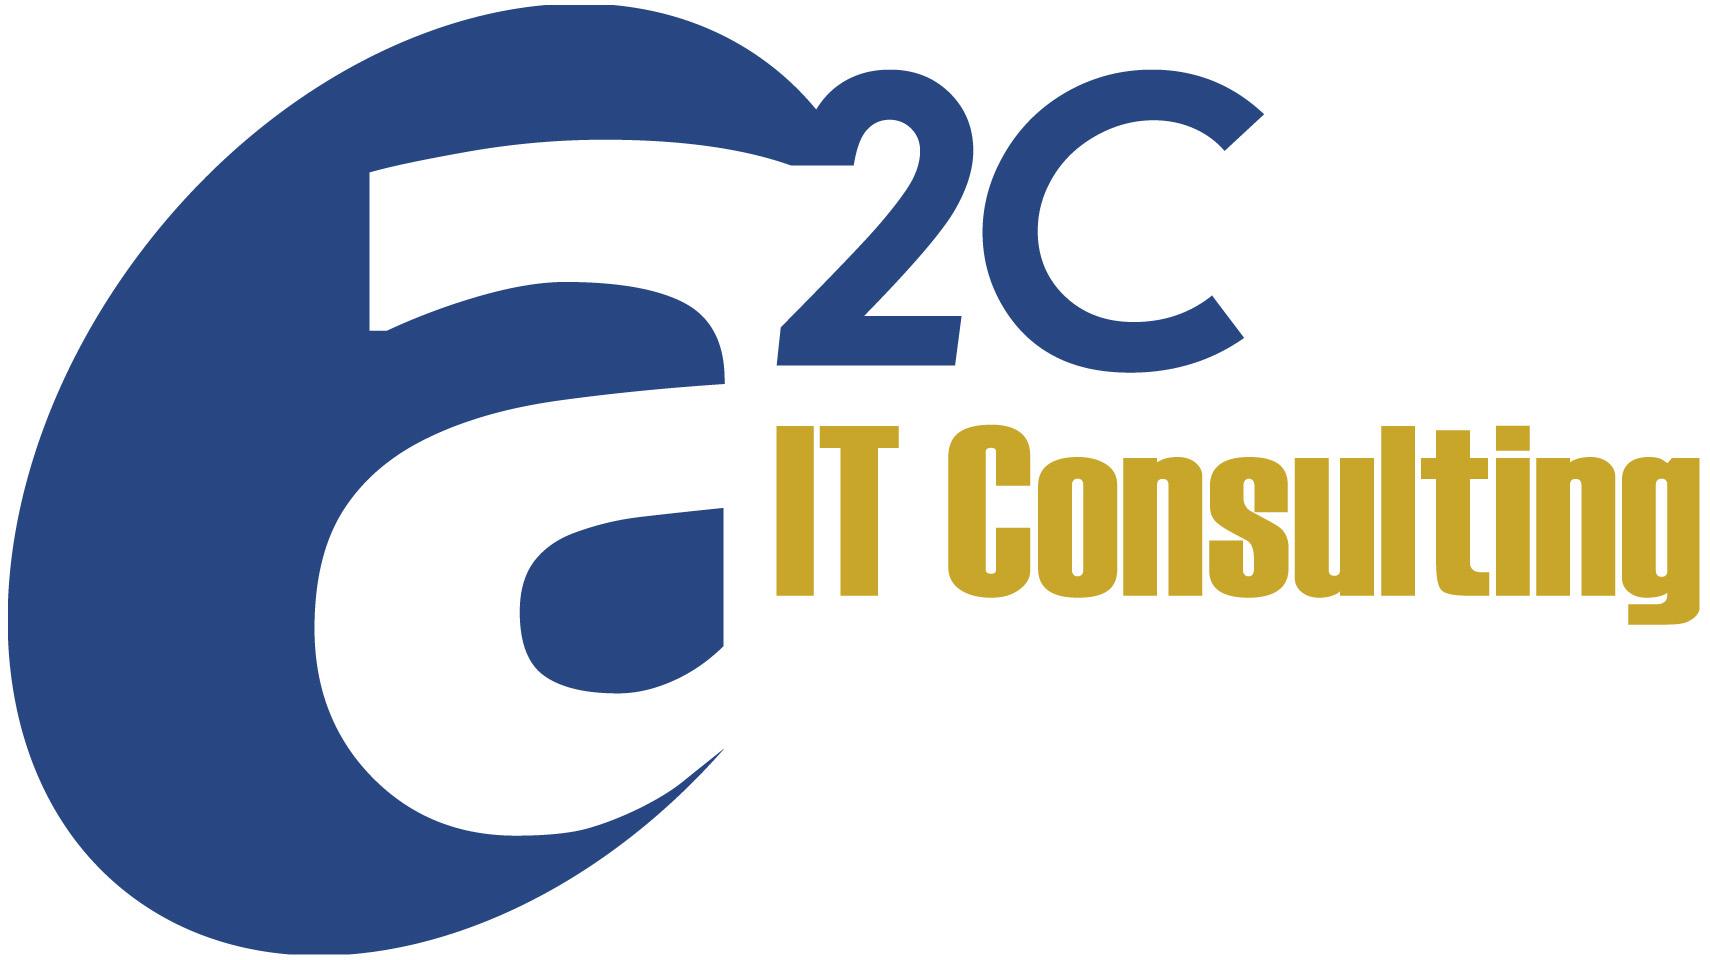 A2C I.T. Consulting Company Profile